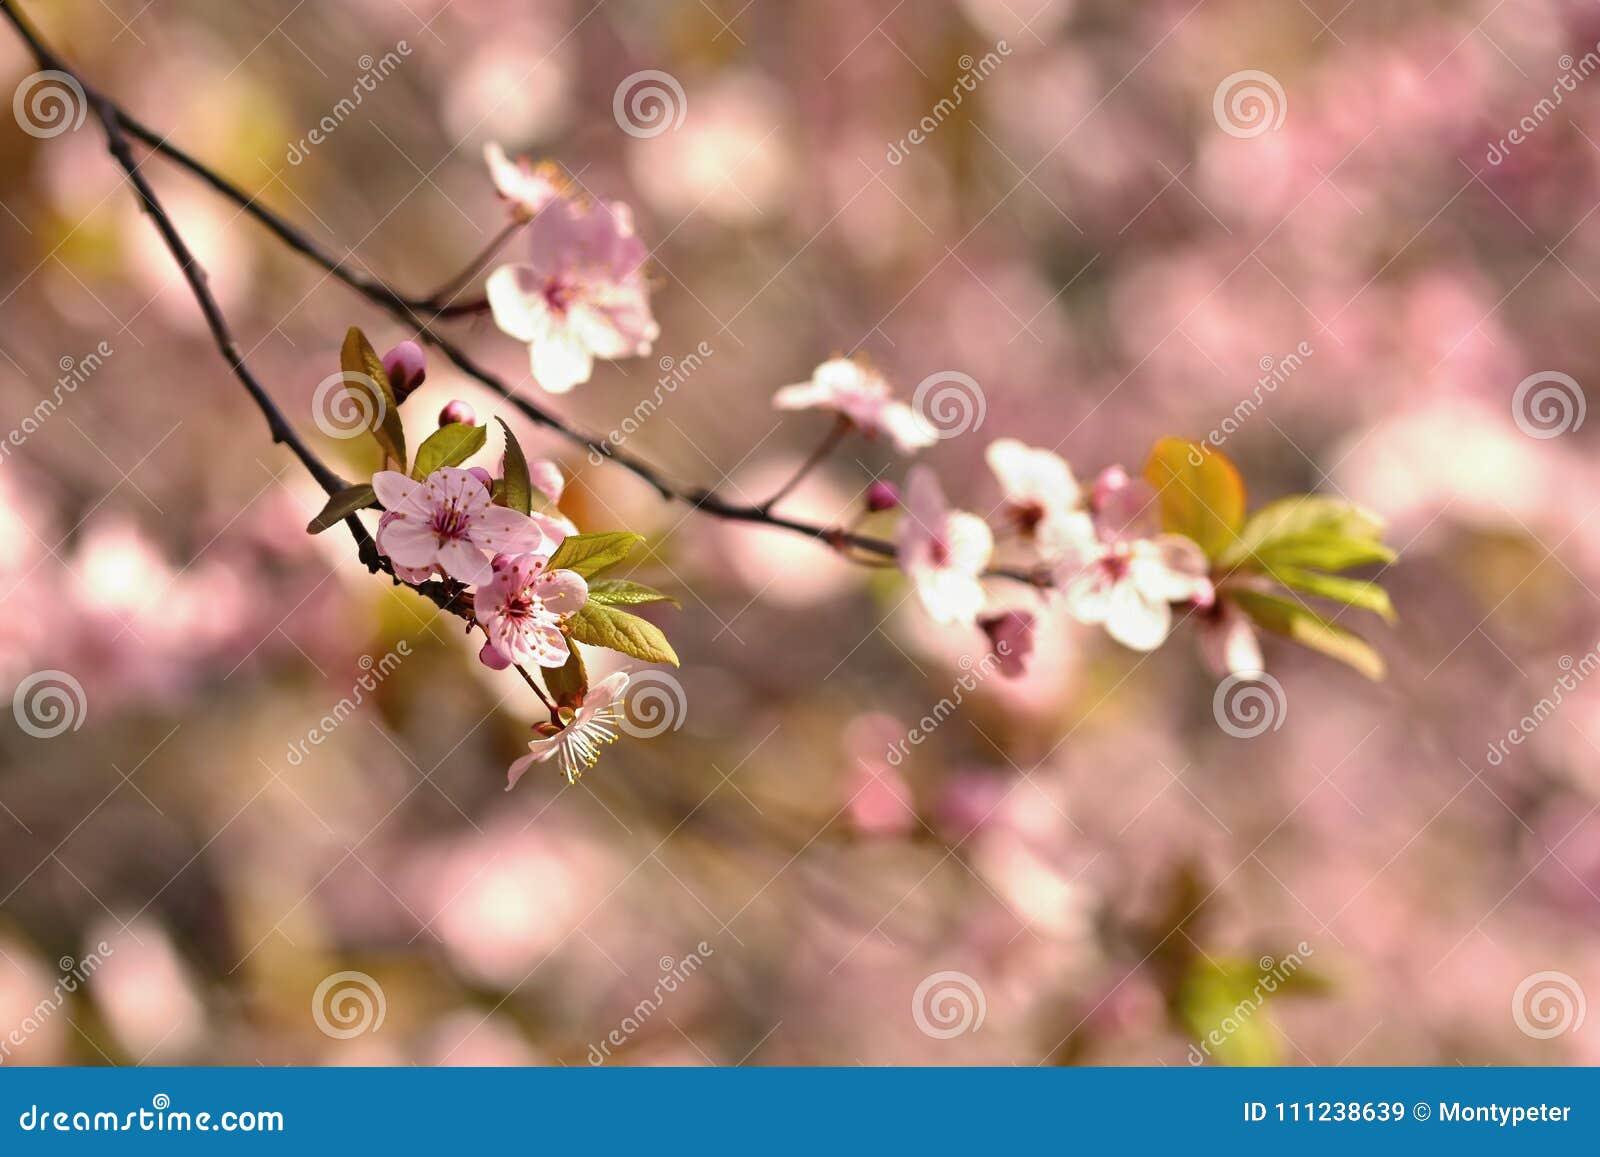 Cherry Blossom Trees Nature And Springtime Background Pink Sakura